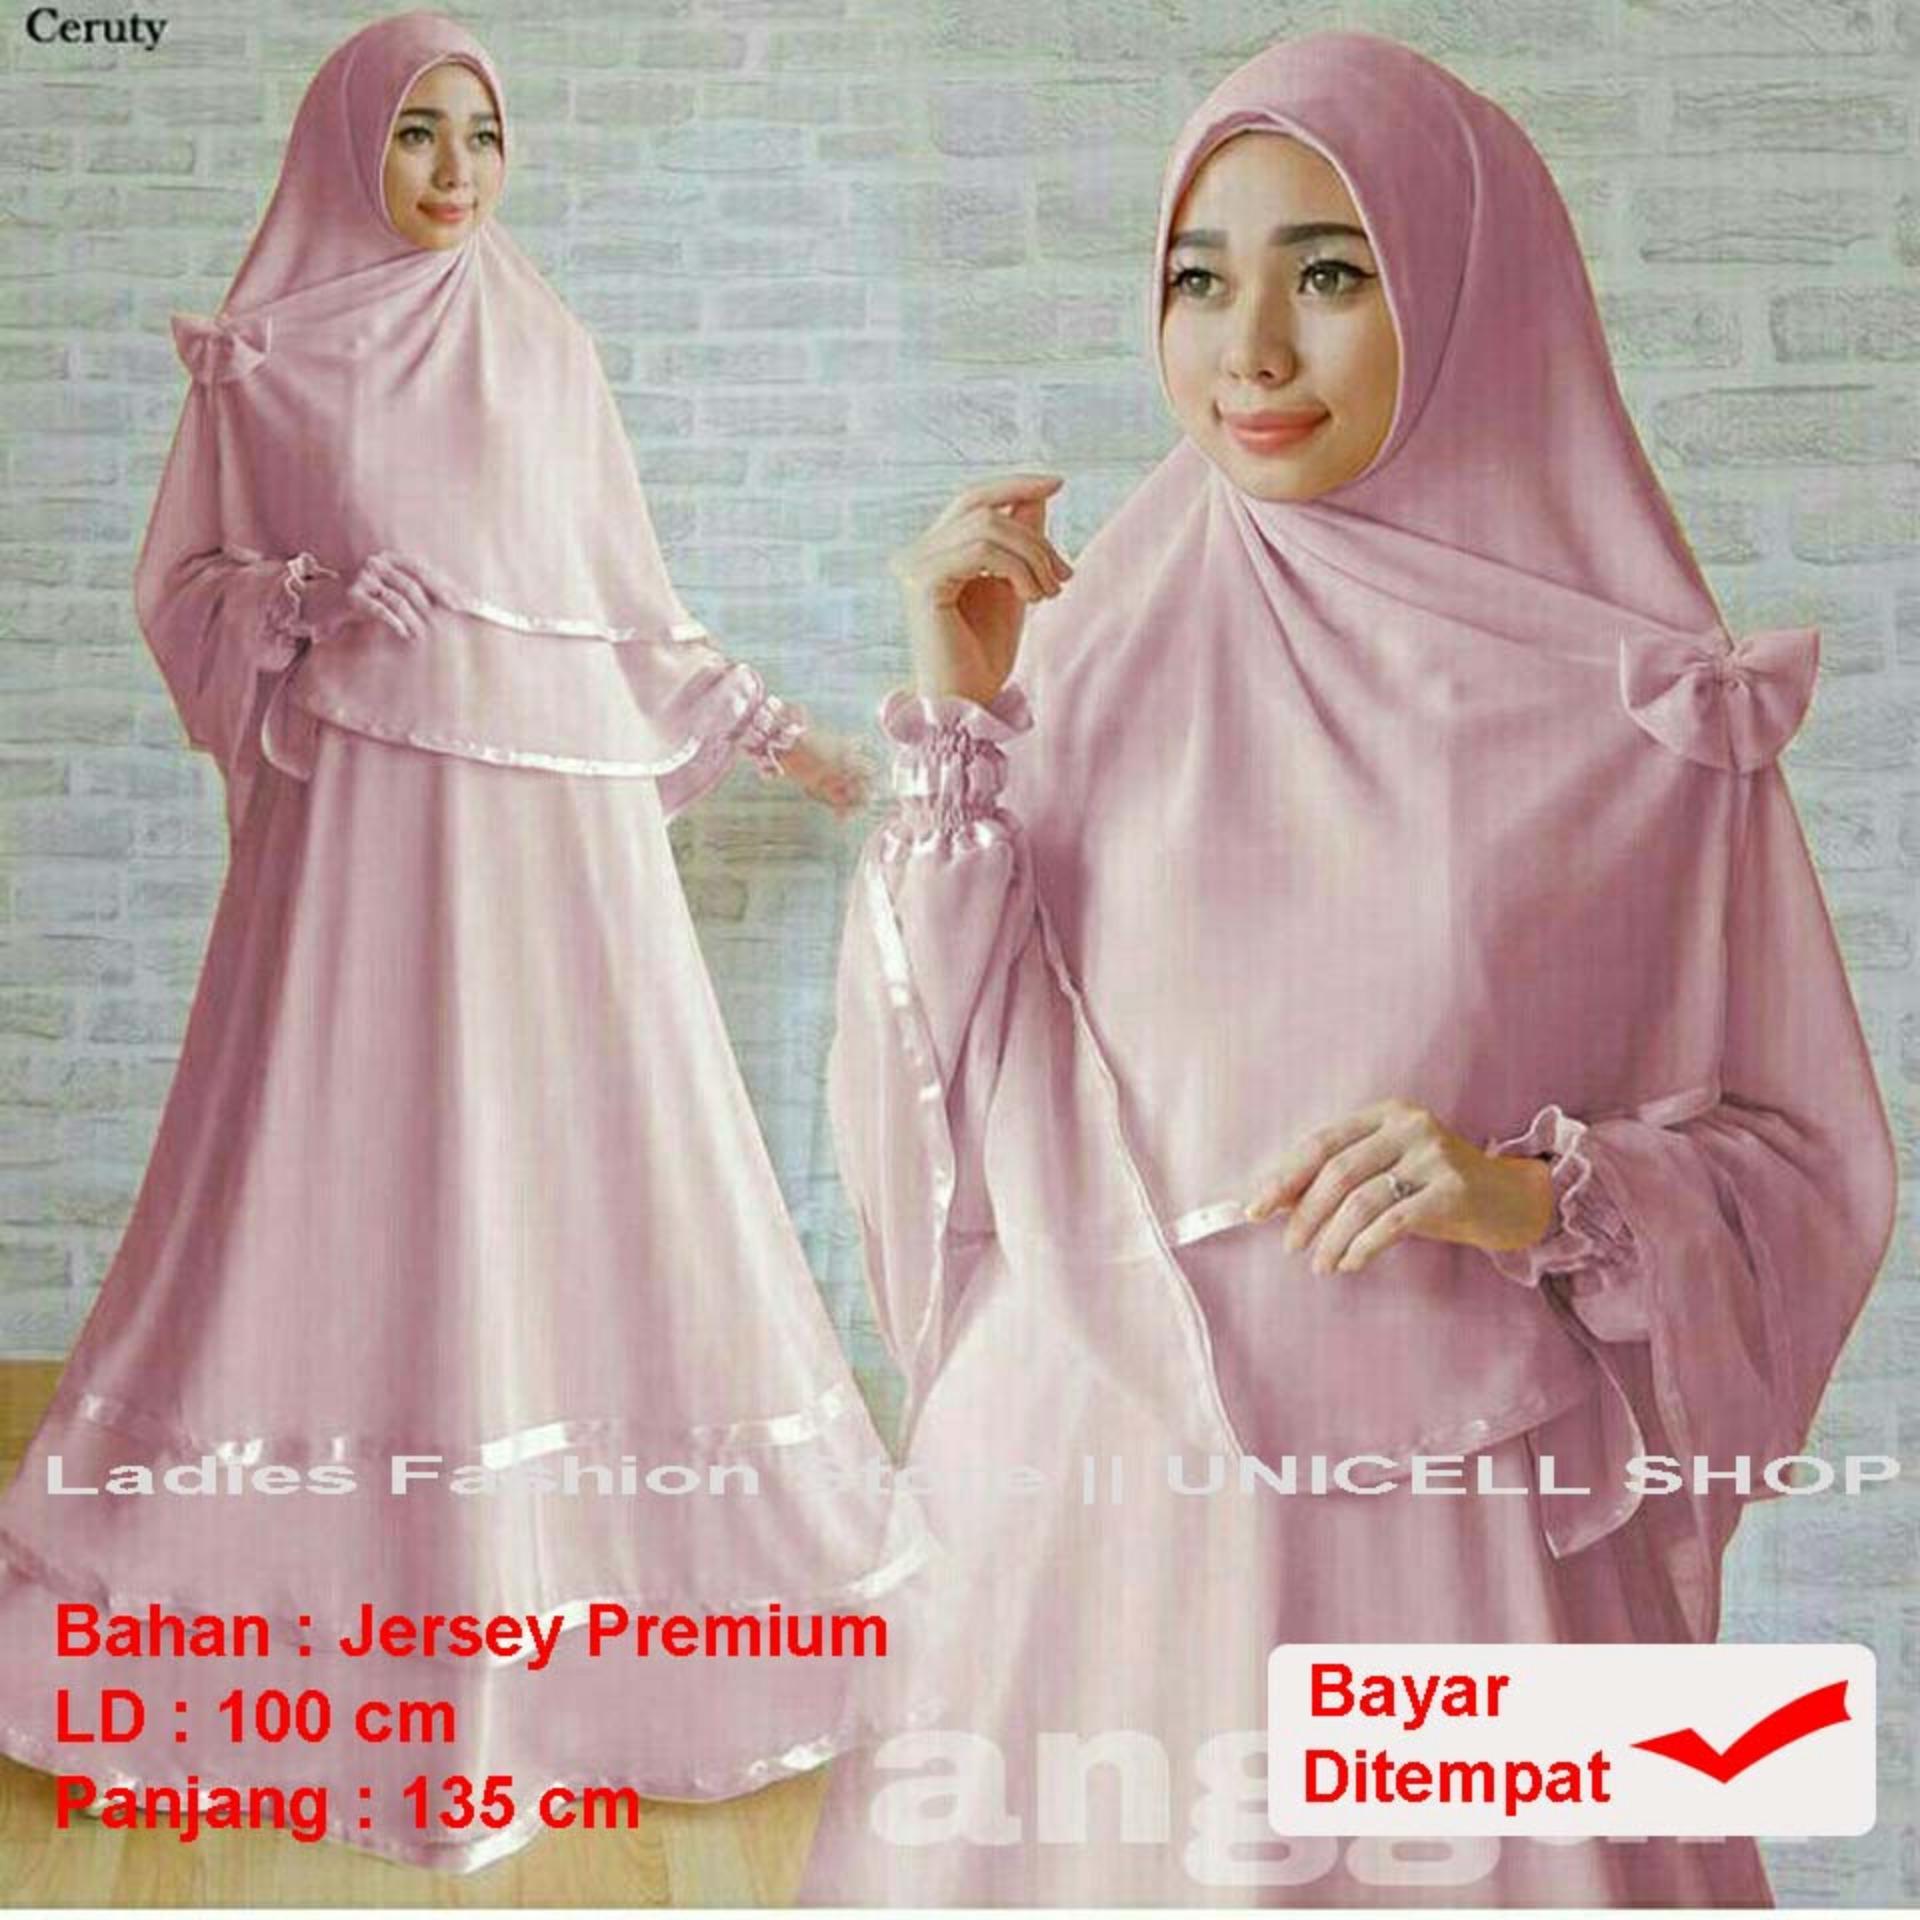 UC Baju Gamis Muslimah syari Fitri Busui / Set Terusan Maxi / Syari Simple Elegant / Baju Muslim Wanita / Kebaya Modern (ggunan) 1N - Pink Dusty /Hijab Muslimah / Baju Muslimah Wanita / Syari Syari'i Muslim / Gaun Muslim / Long Dress Muslimah Wanita